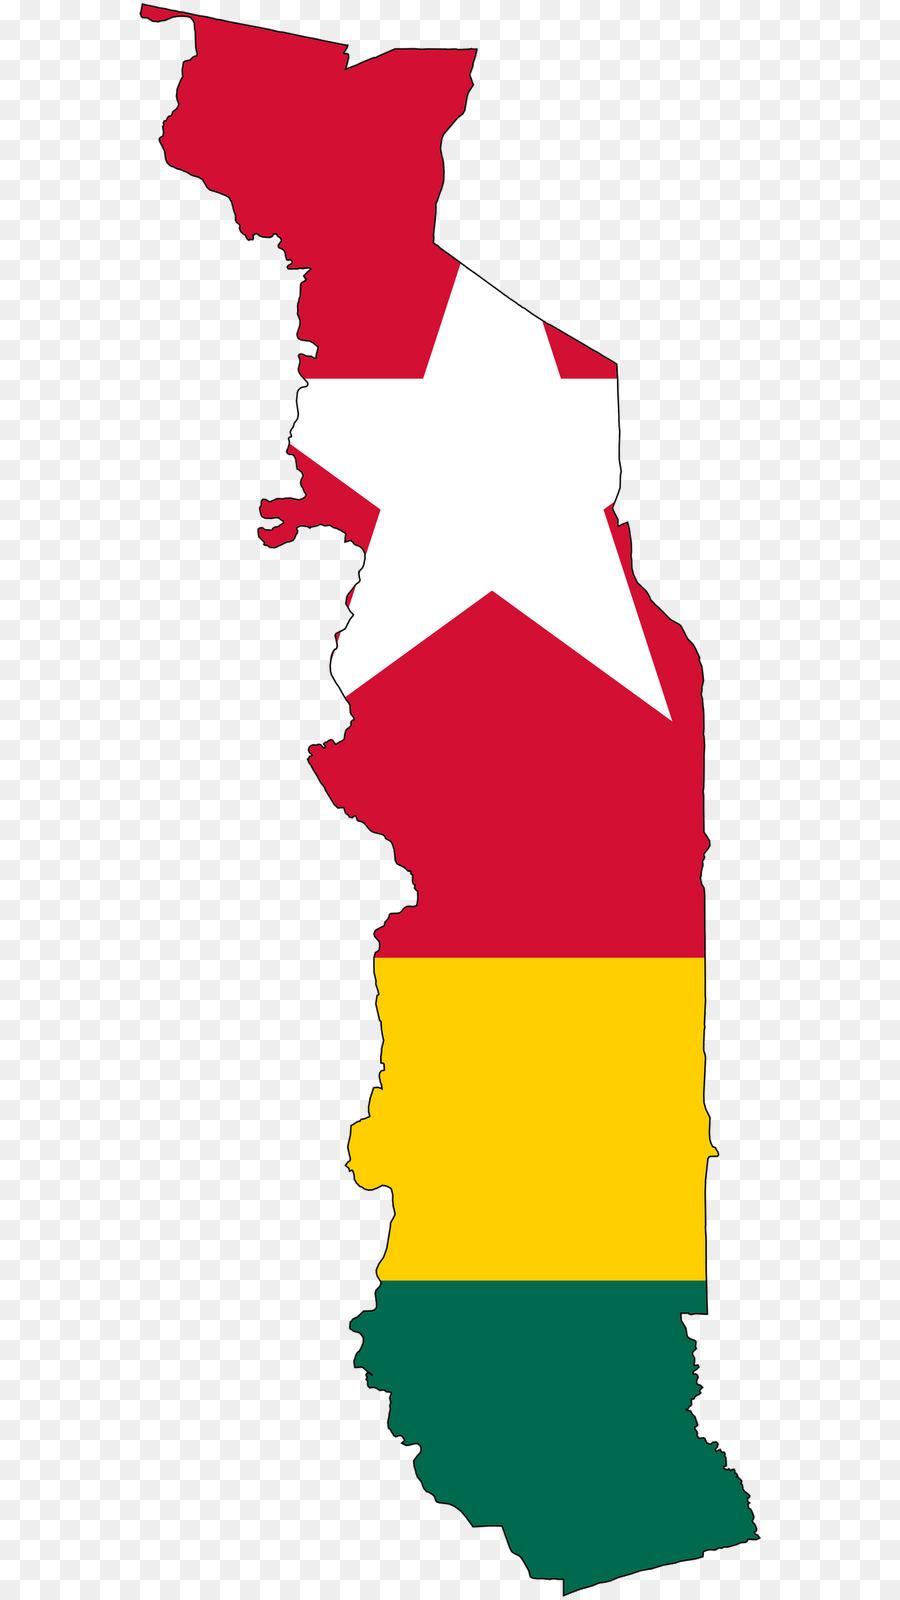 Flag of Togo Map - eva longoria png download - 625*1600 - Free ... Togo Map on